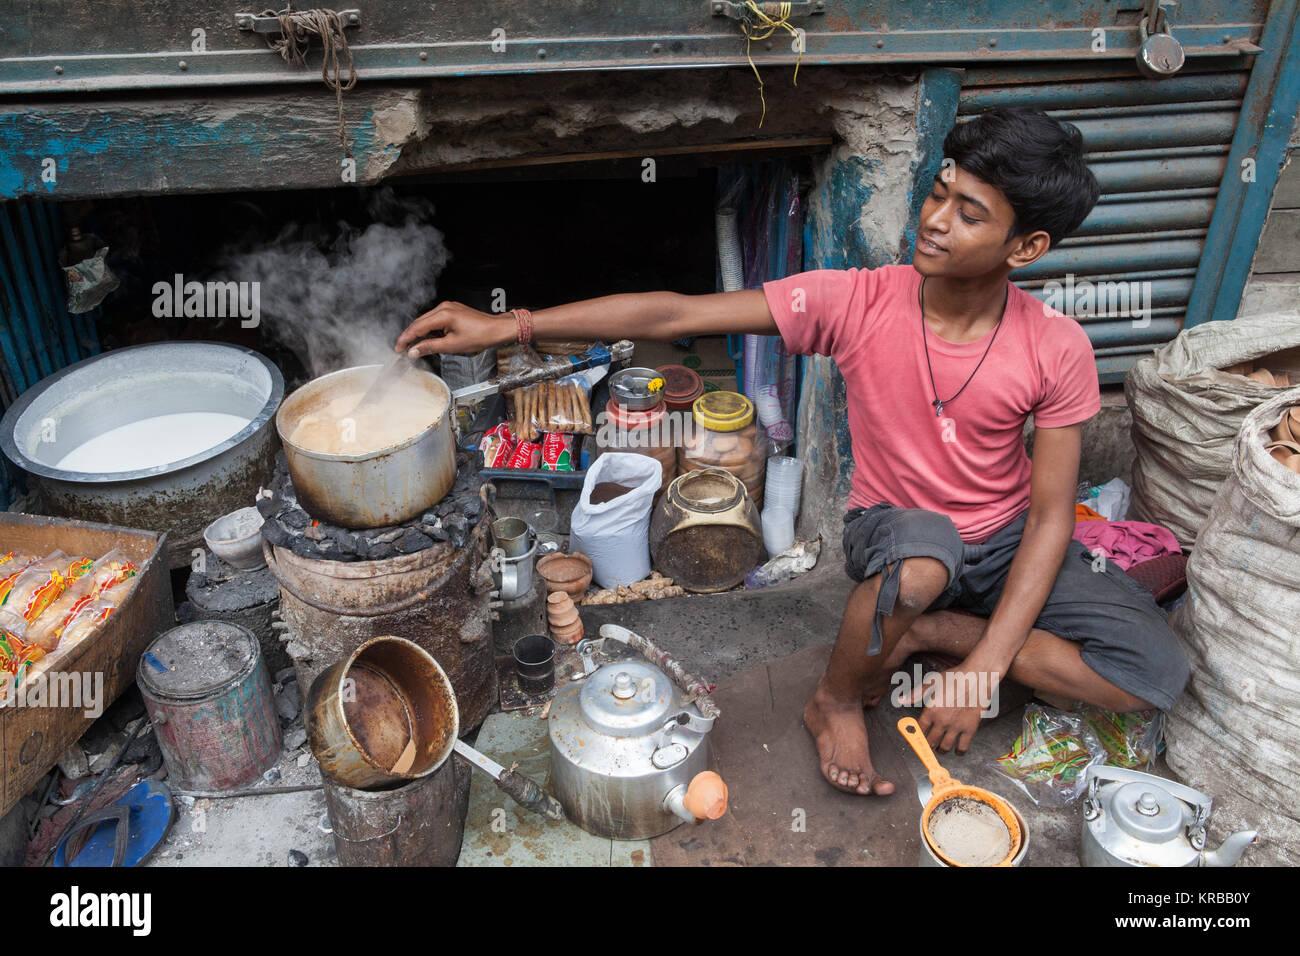 Chai vendor making tea in Kolkata, India - Stock Image